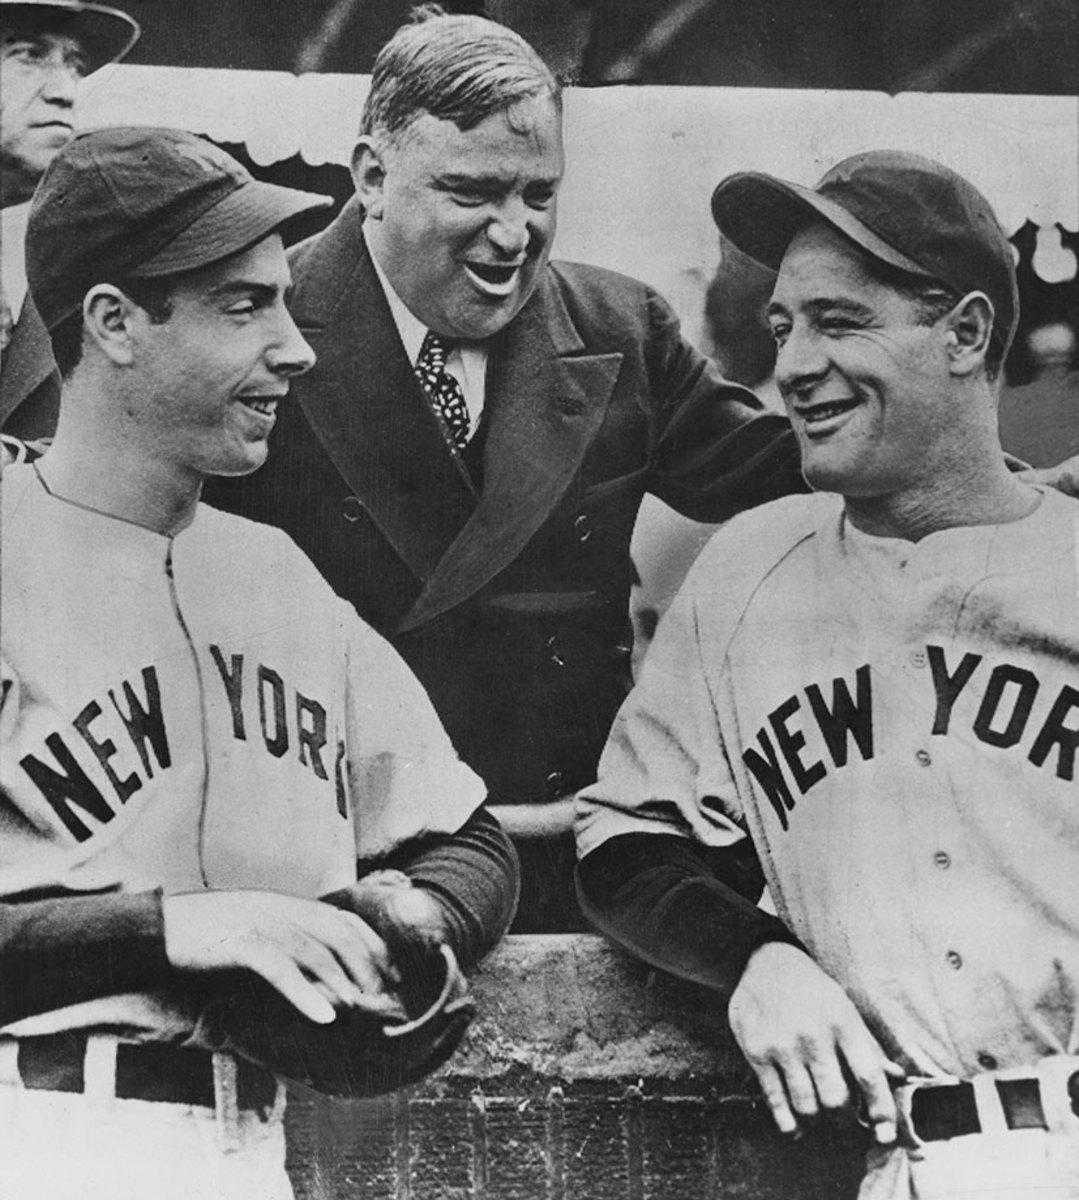 1938-New-York-Yankees-Joe-DiMaggio-Lou-Gehrig-Fiorello-La-Guardia.jpg